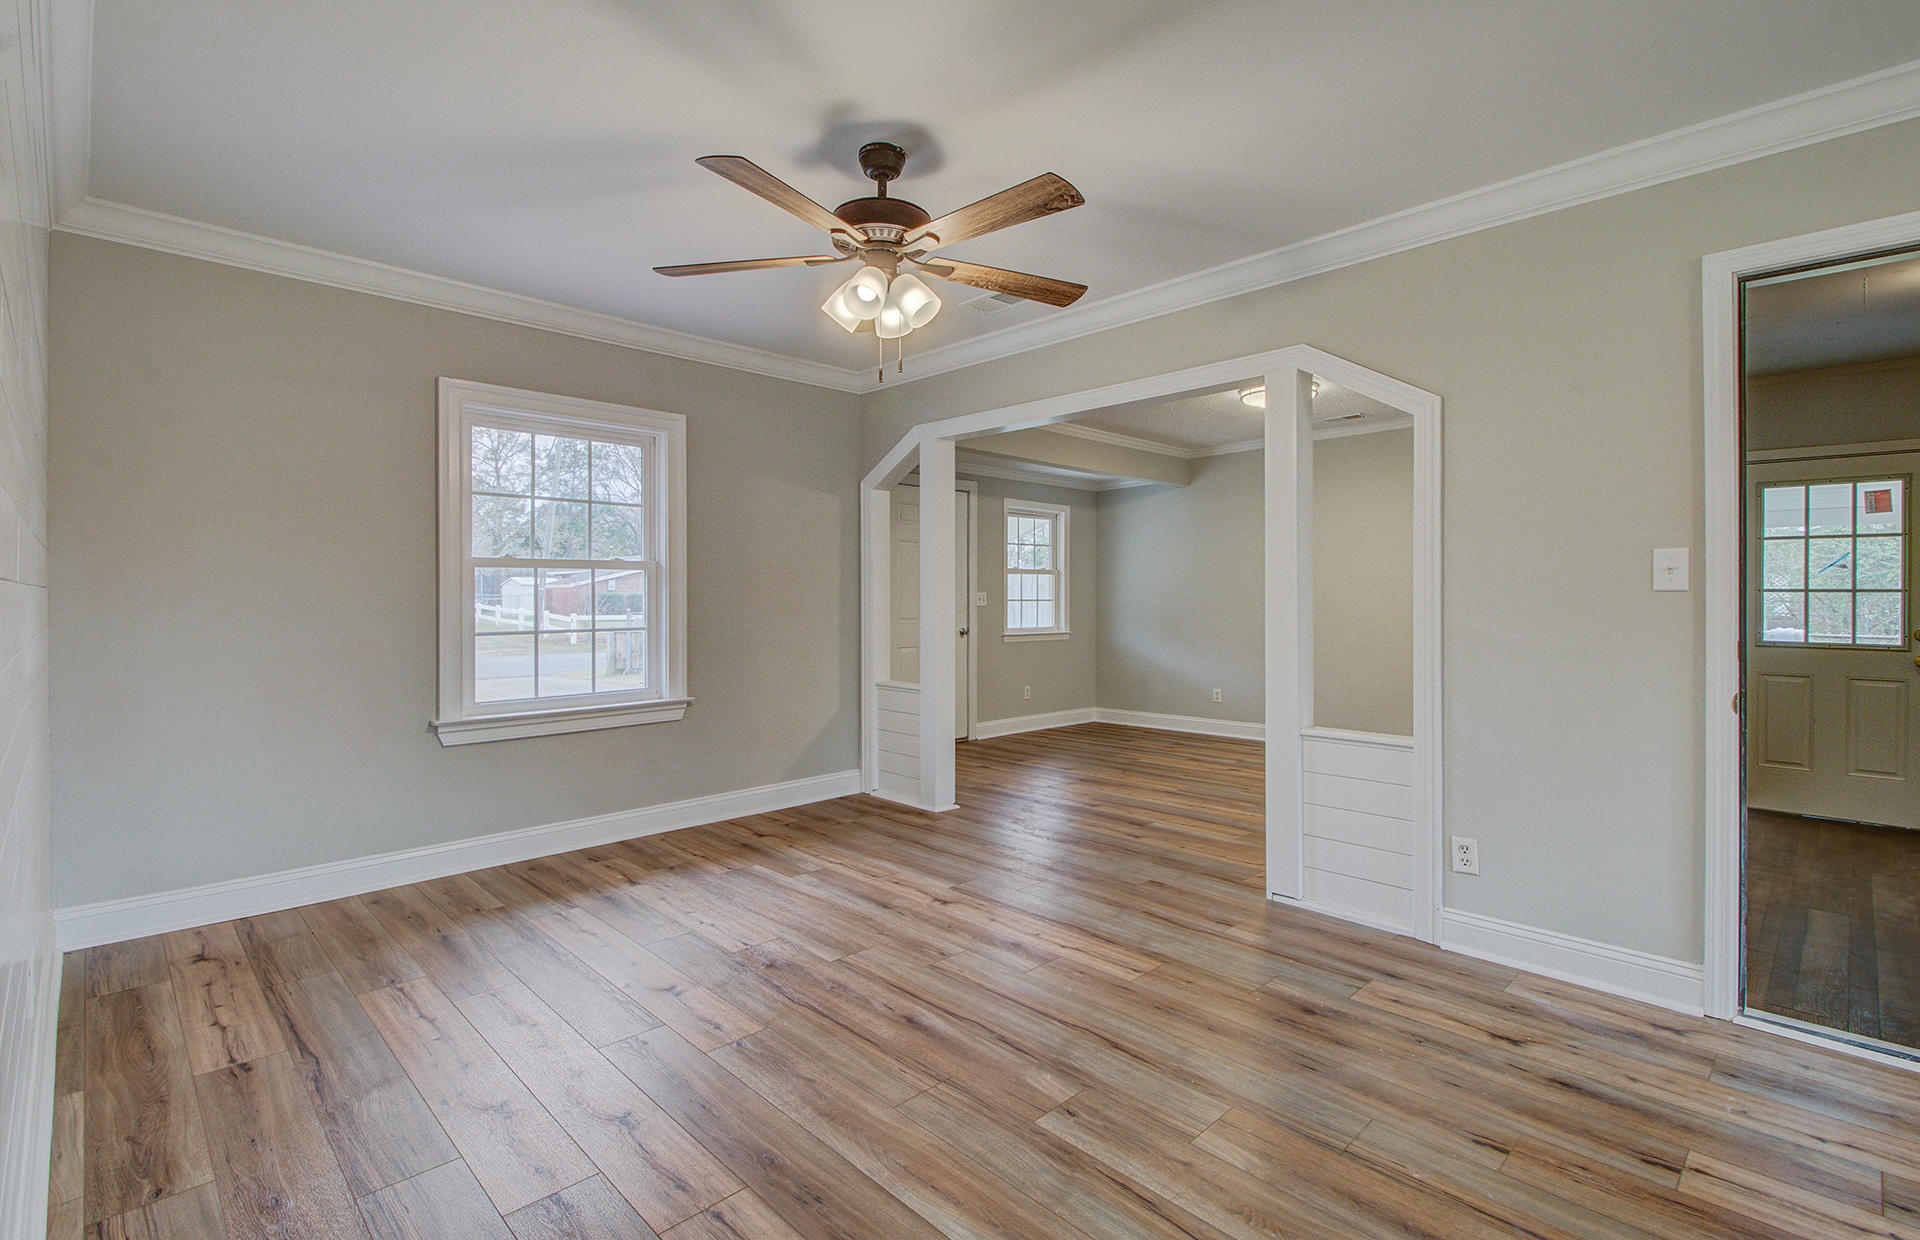 Sedgefield Section I Homes For Sale - 30 Aldene, Goose Creek, SC - 22